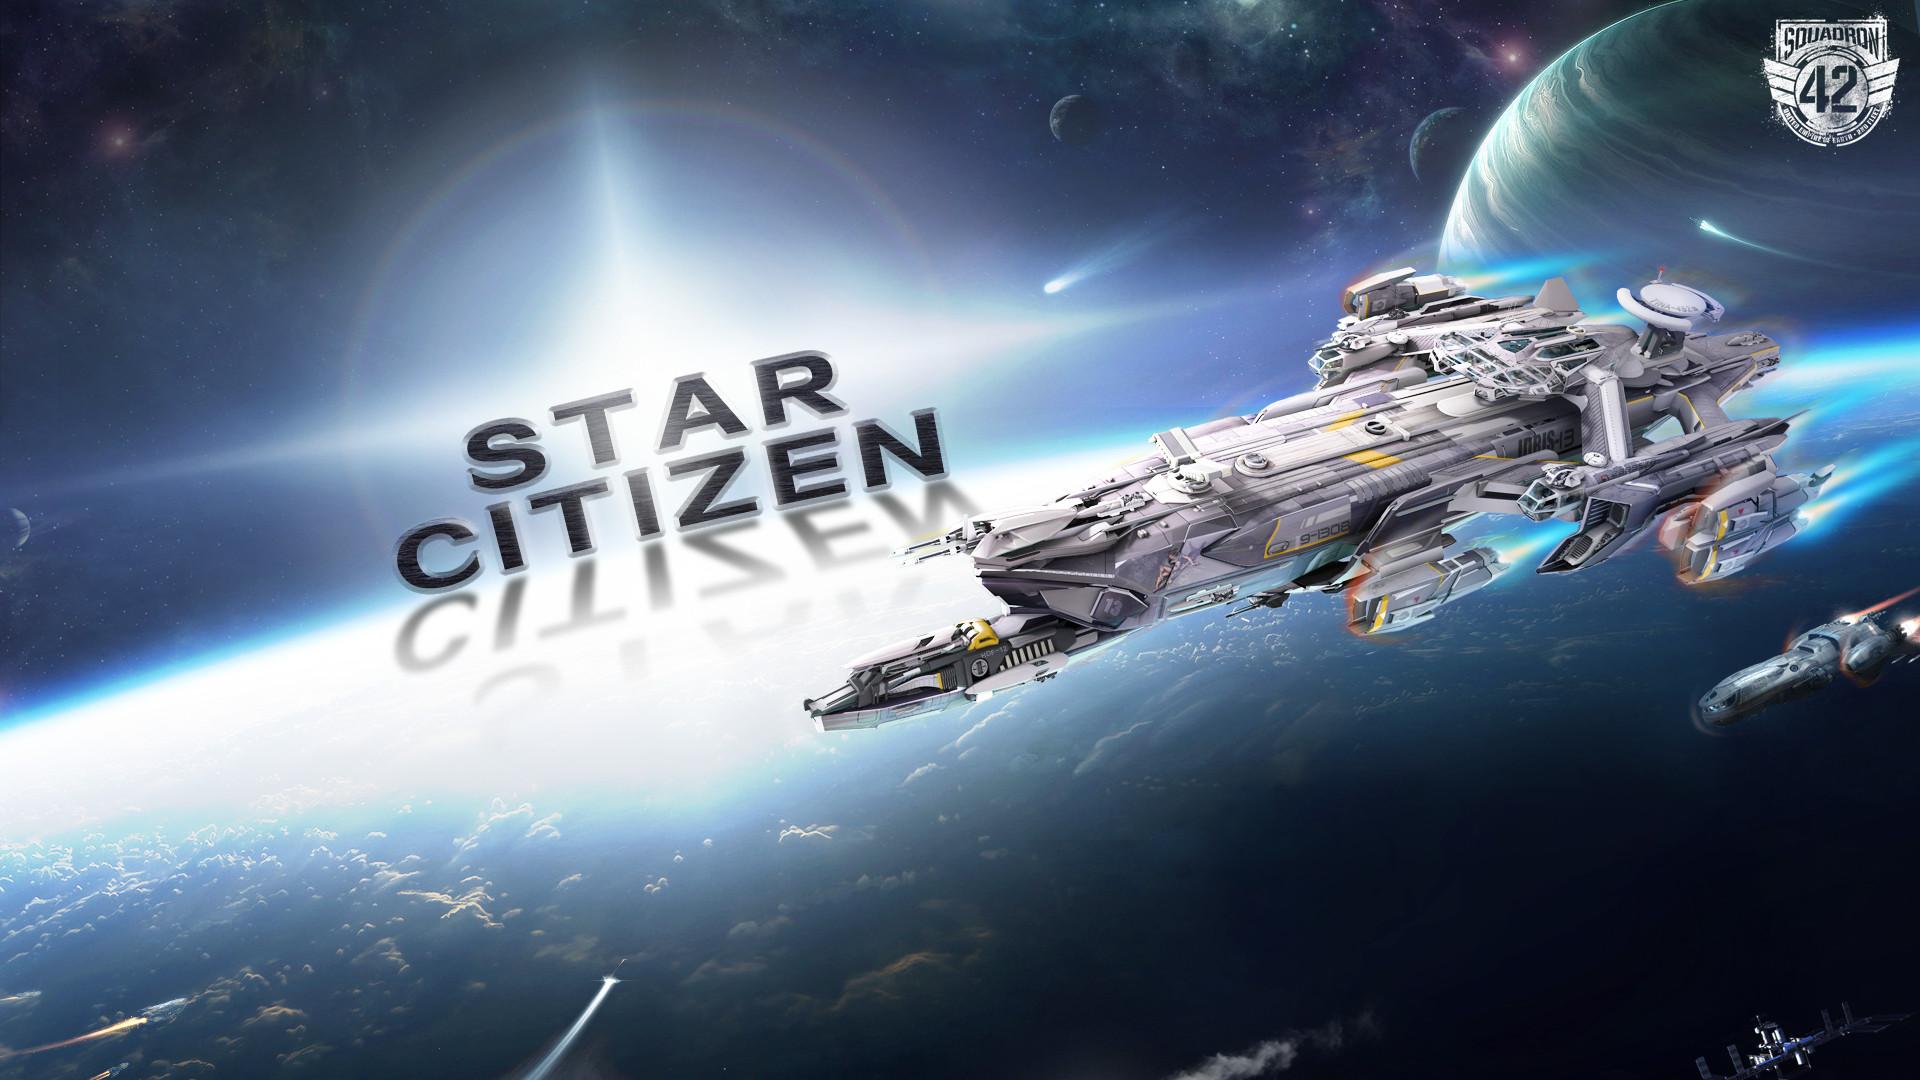 FIRST PLAY: Star Citizen space sim